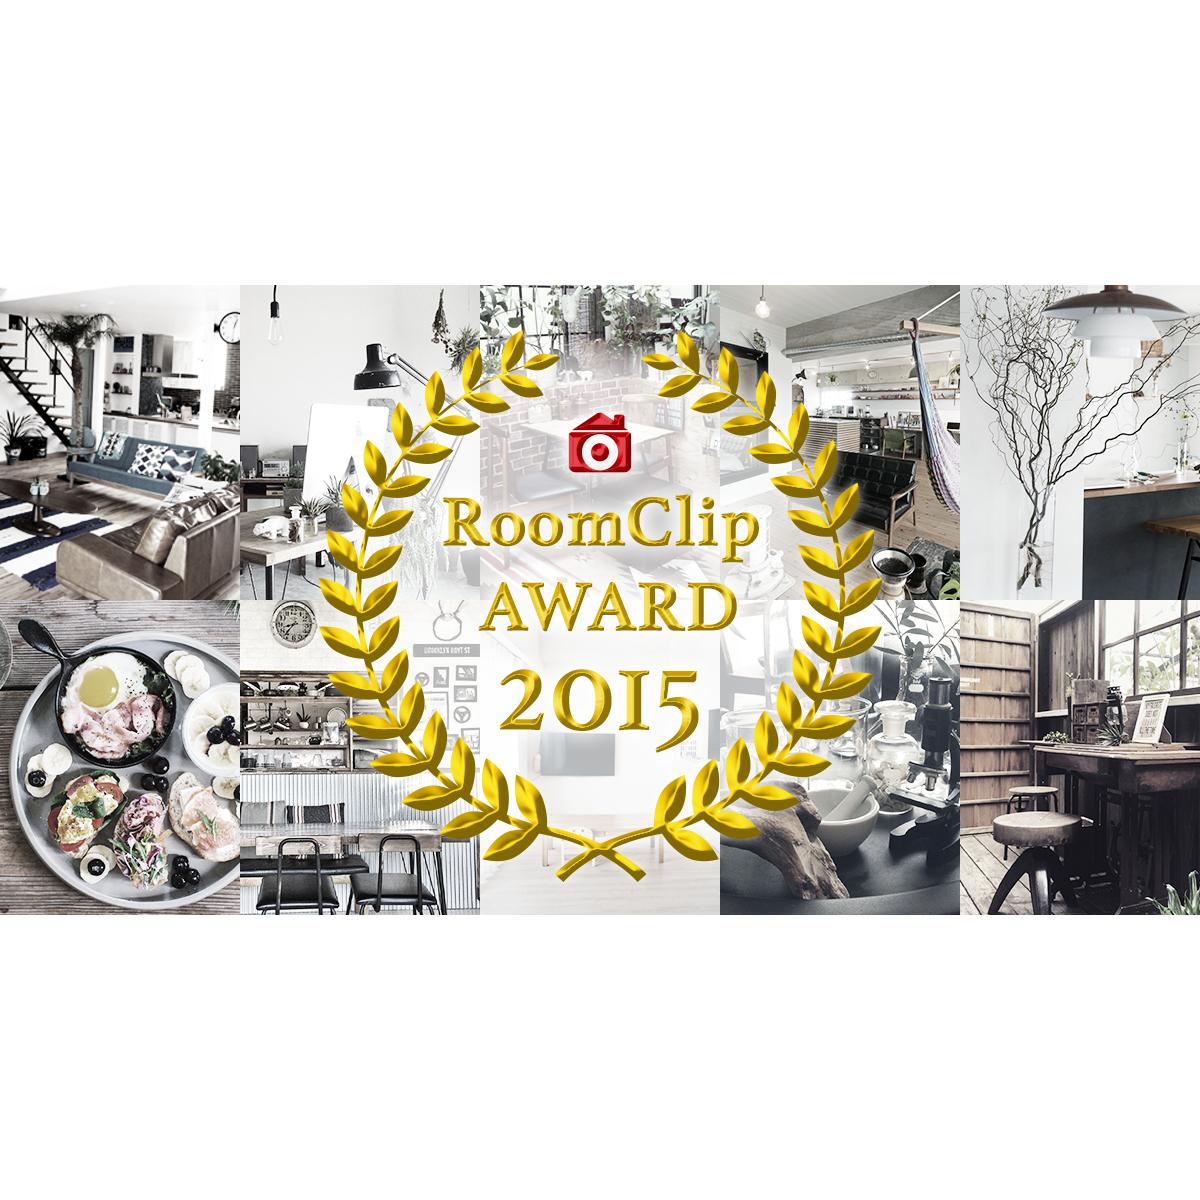 RoomClip Award 2015☆今年のインテリアトレンドを大発表!